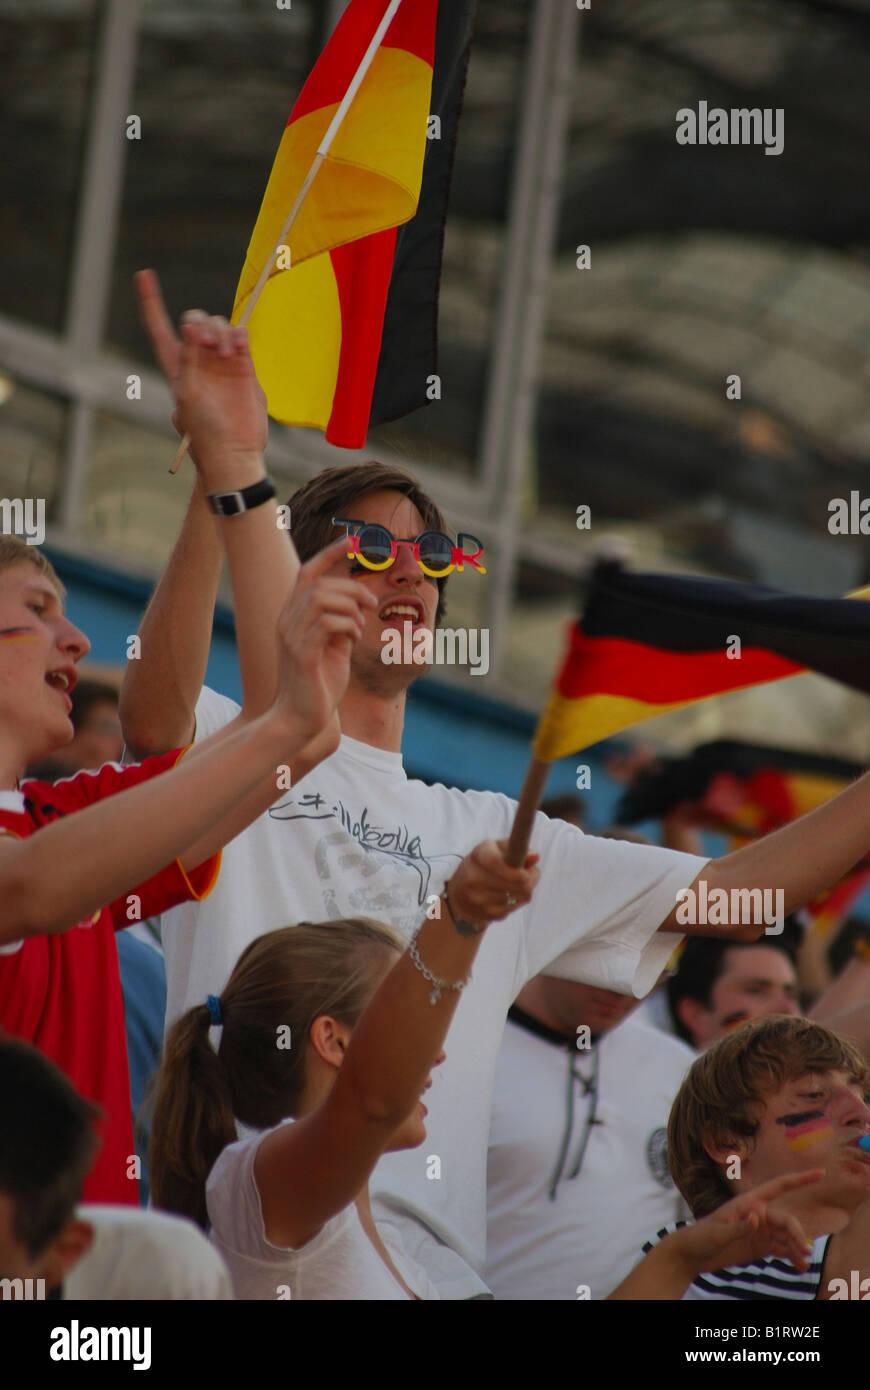 Europe, Germany, Bavaria, Munich, Football, Olympic, Stadium, Finale, UEFA, EURO, 2008, spain, championship, Olympiastadion - Stock Image